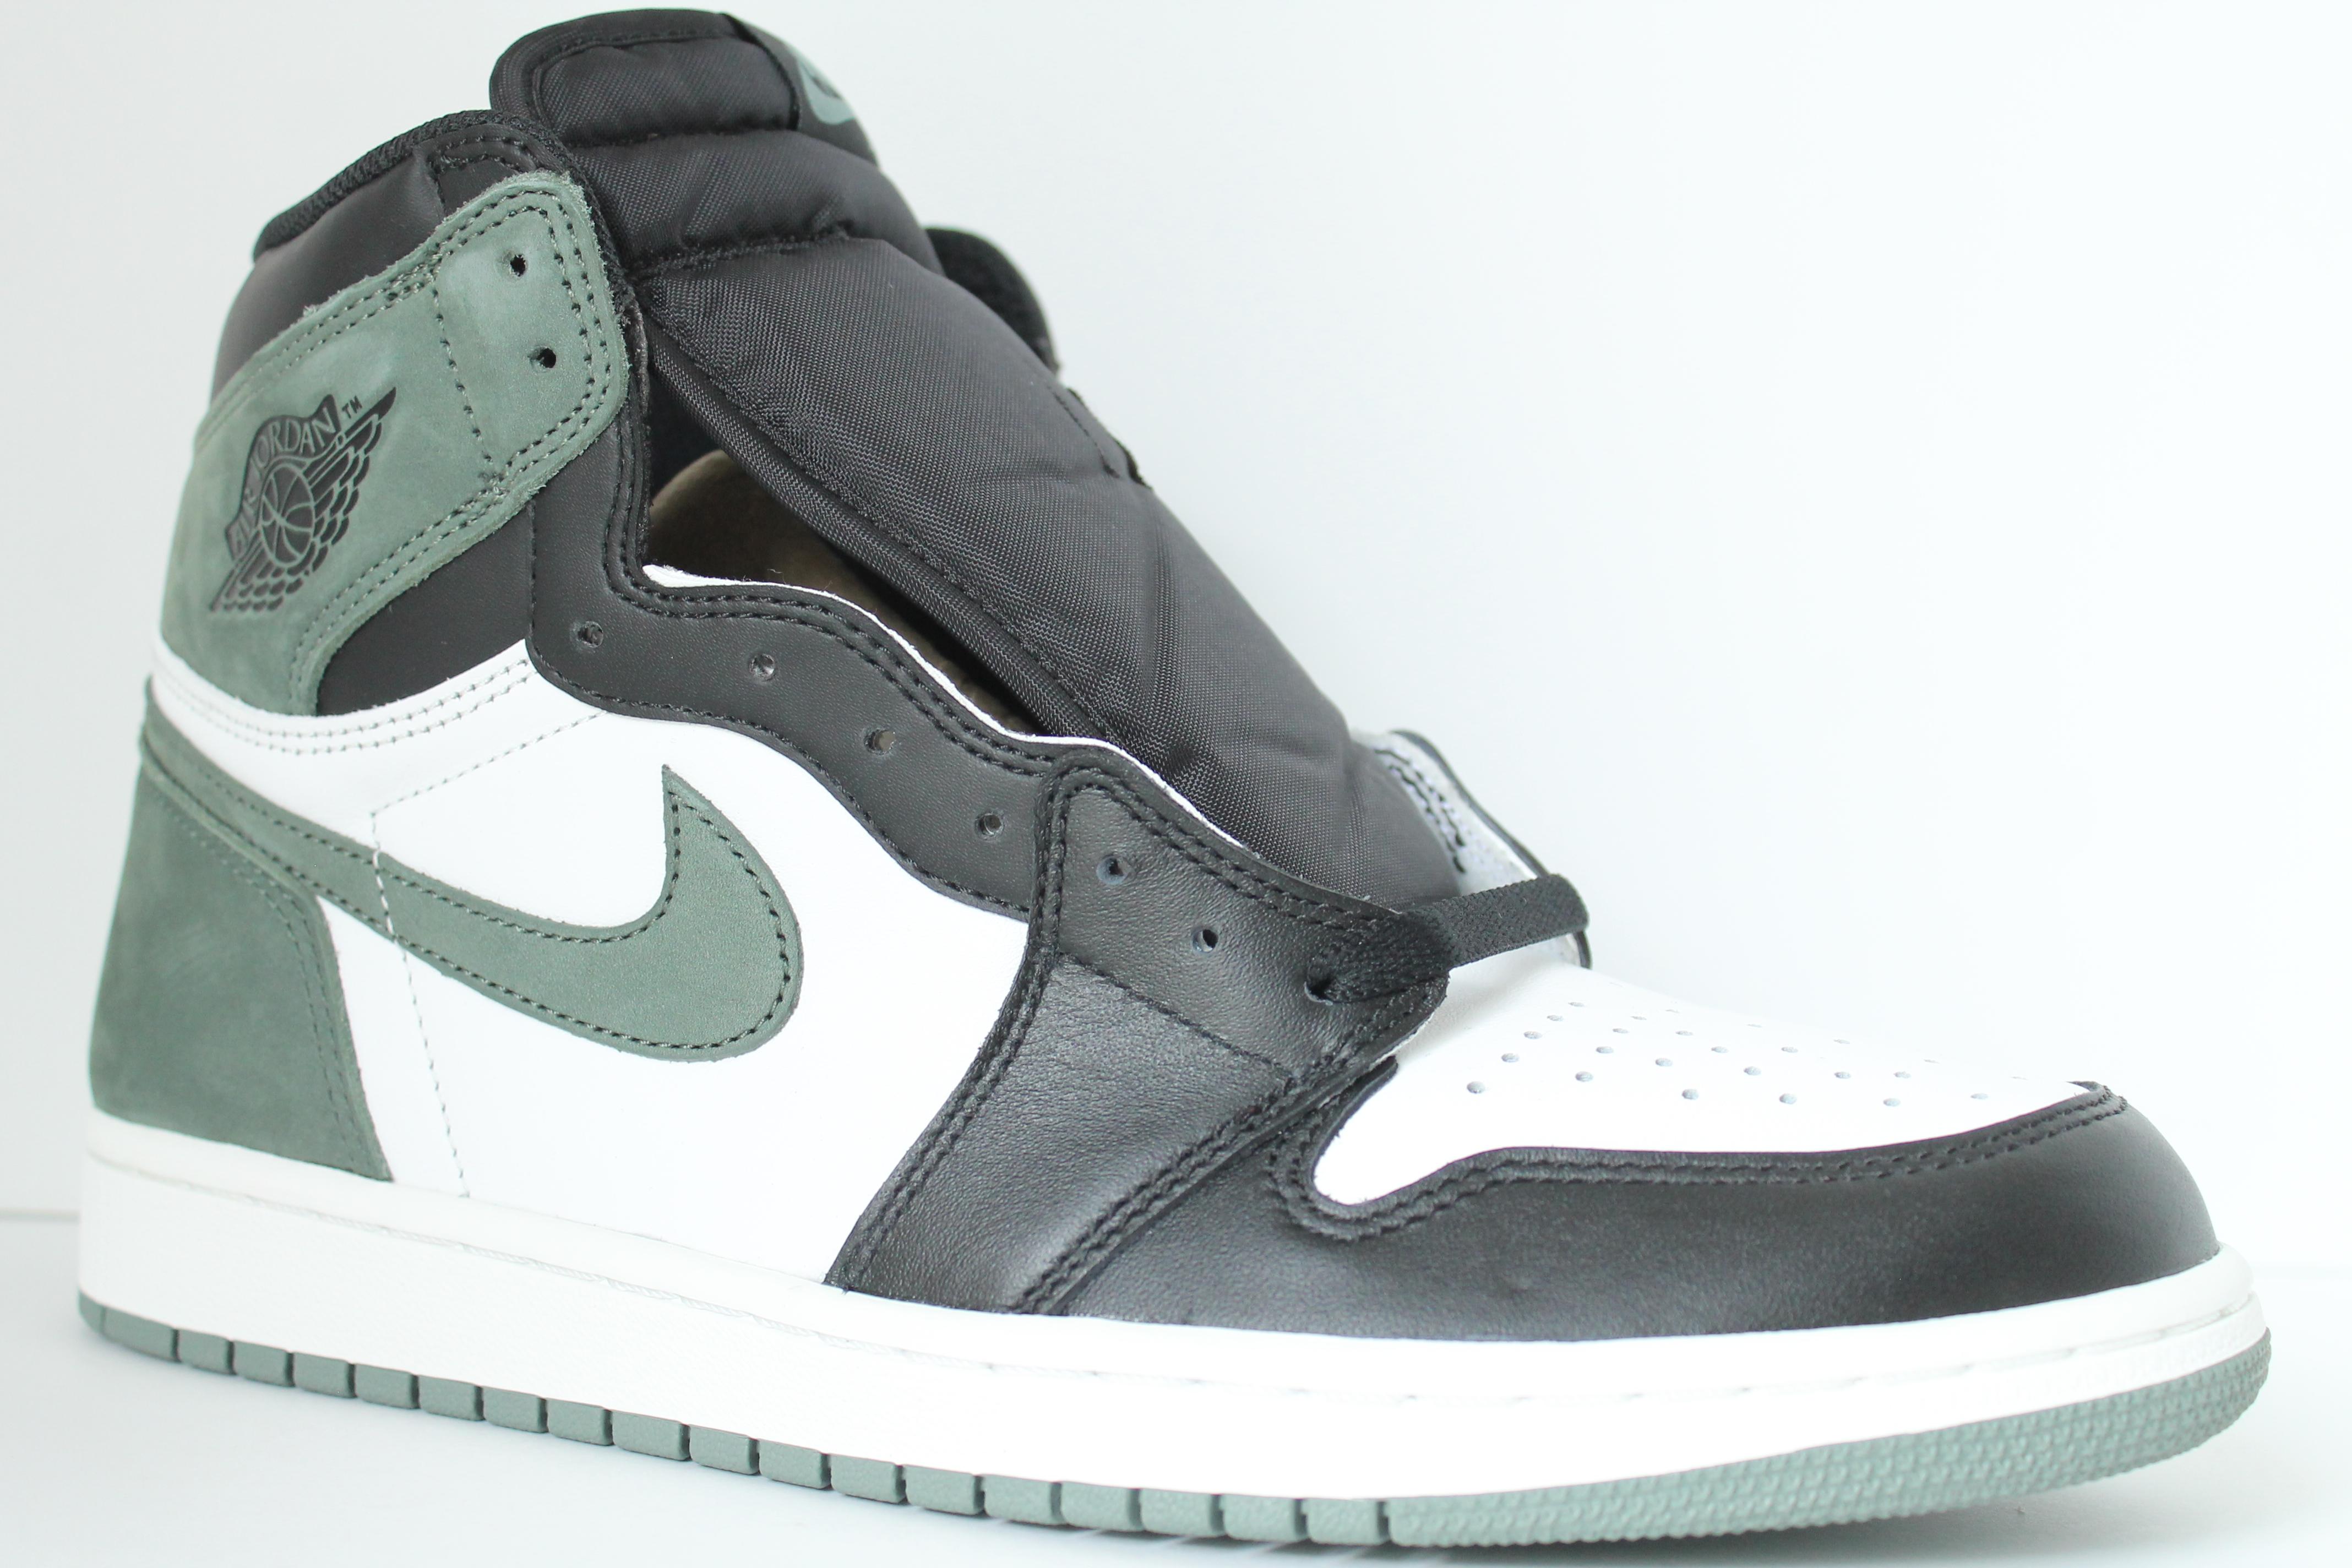 61d88cd45cc8 ... Air Jordan 1 Retro High OG – Clay Green ...